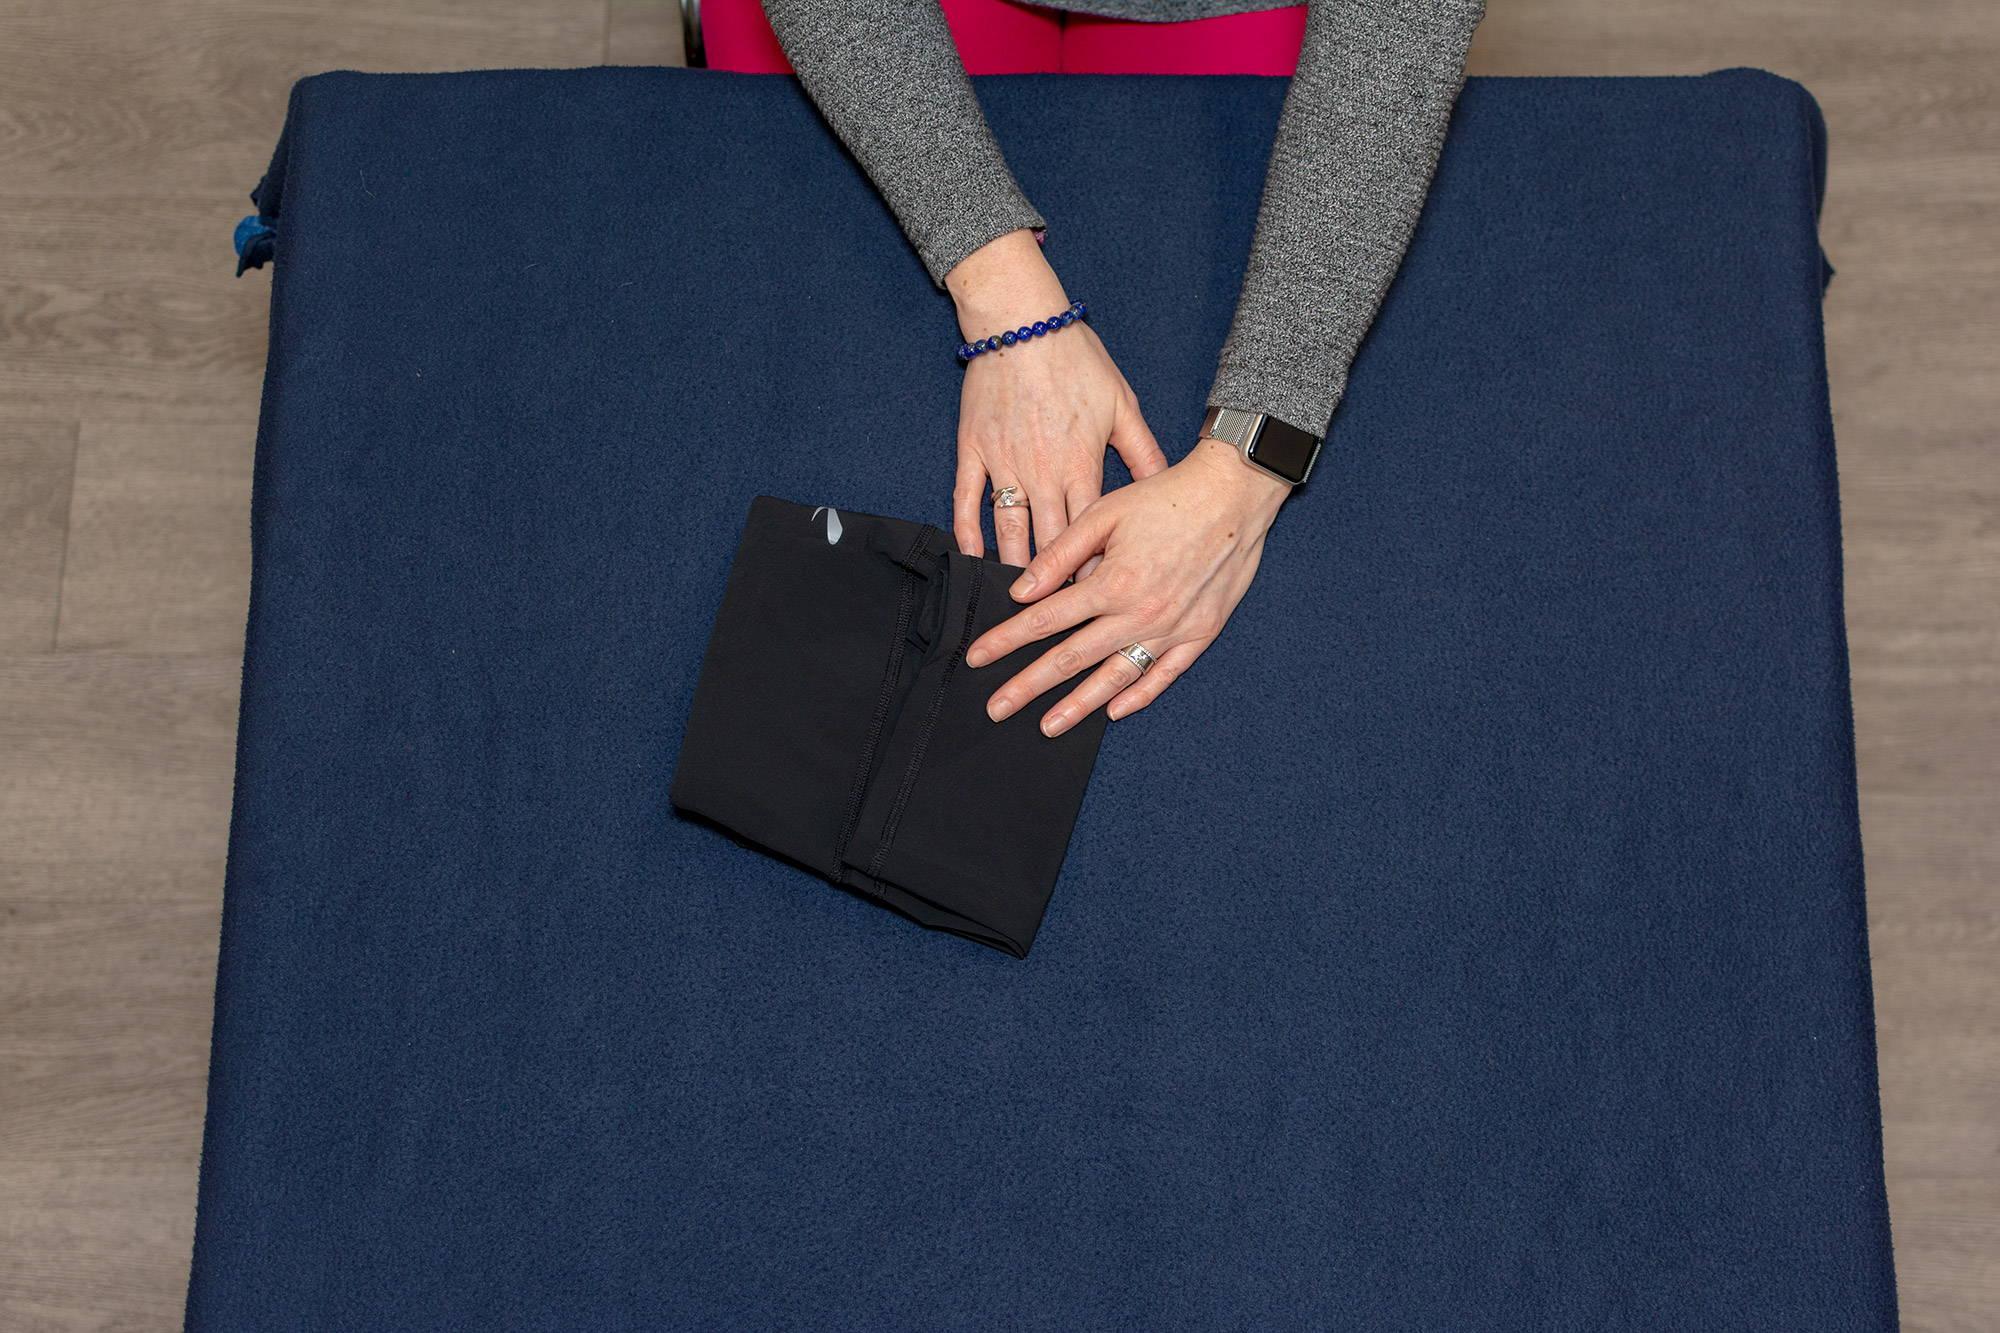 hands folding short shorts